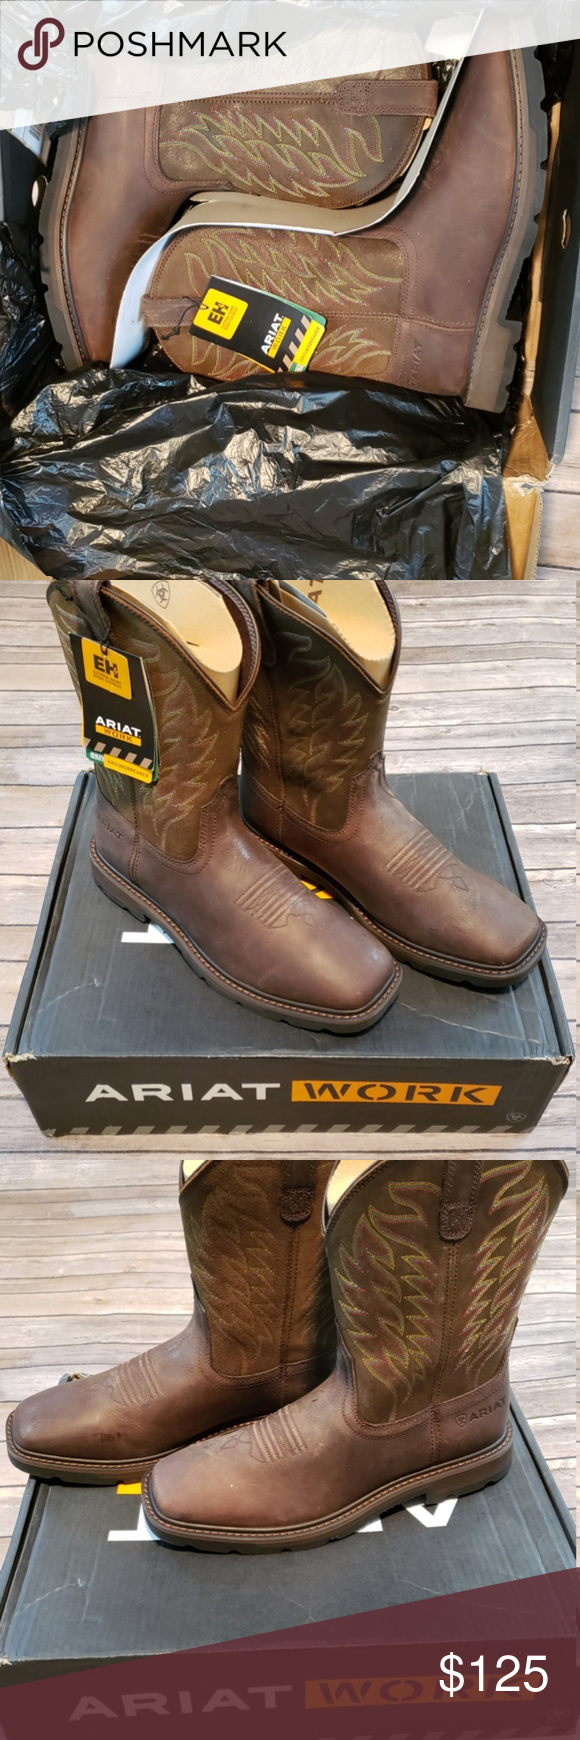 137fe545698 ARIAT Groundbreaker Work Boots Sz 10.5 D Brand new with box ARIAT ...